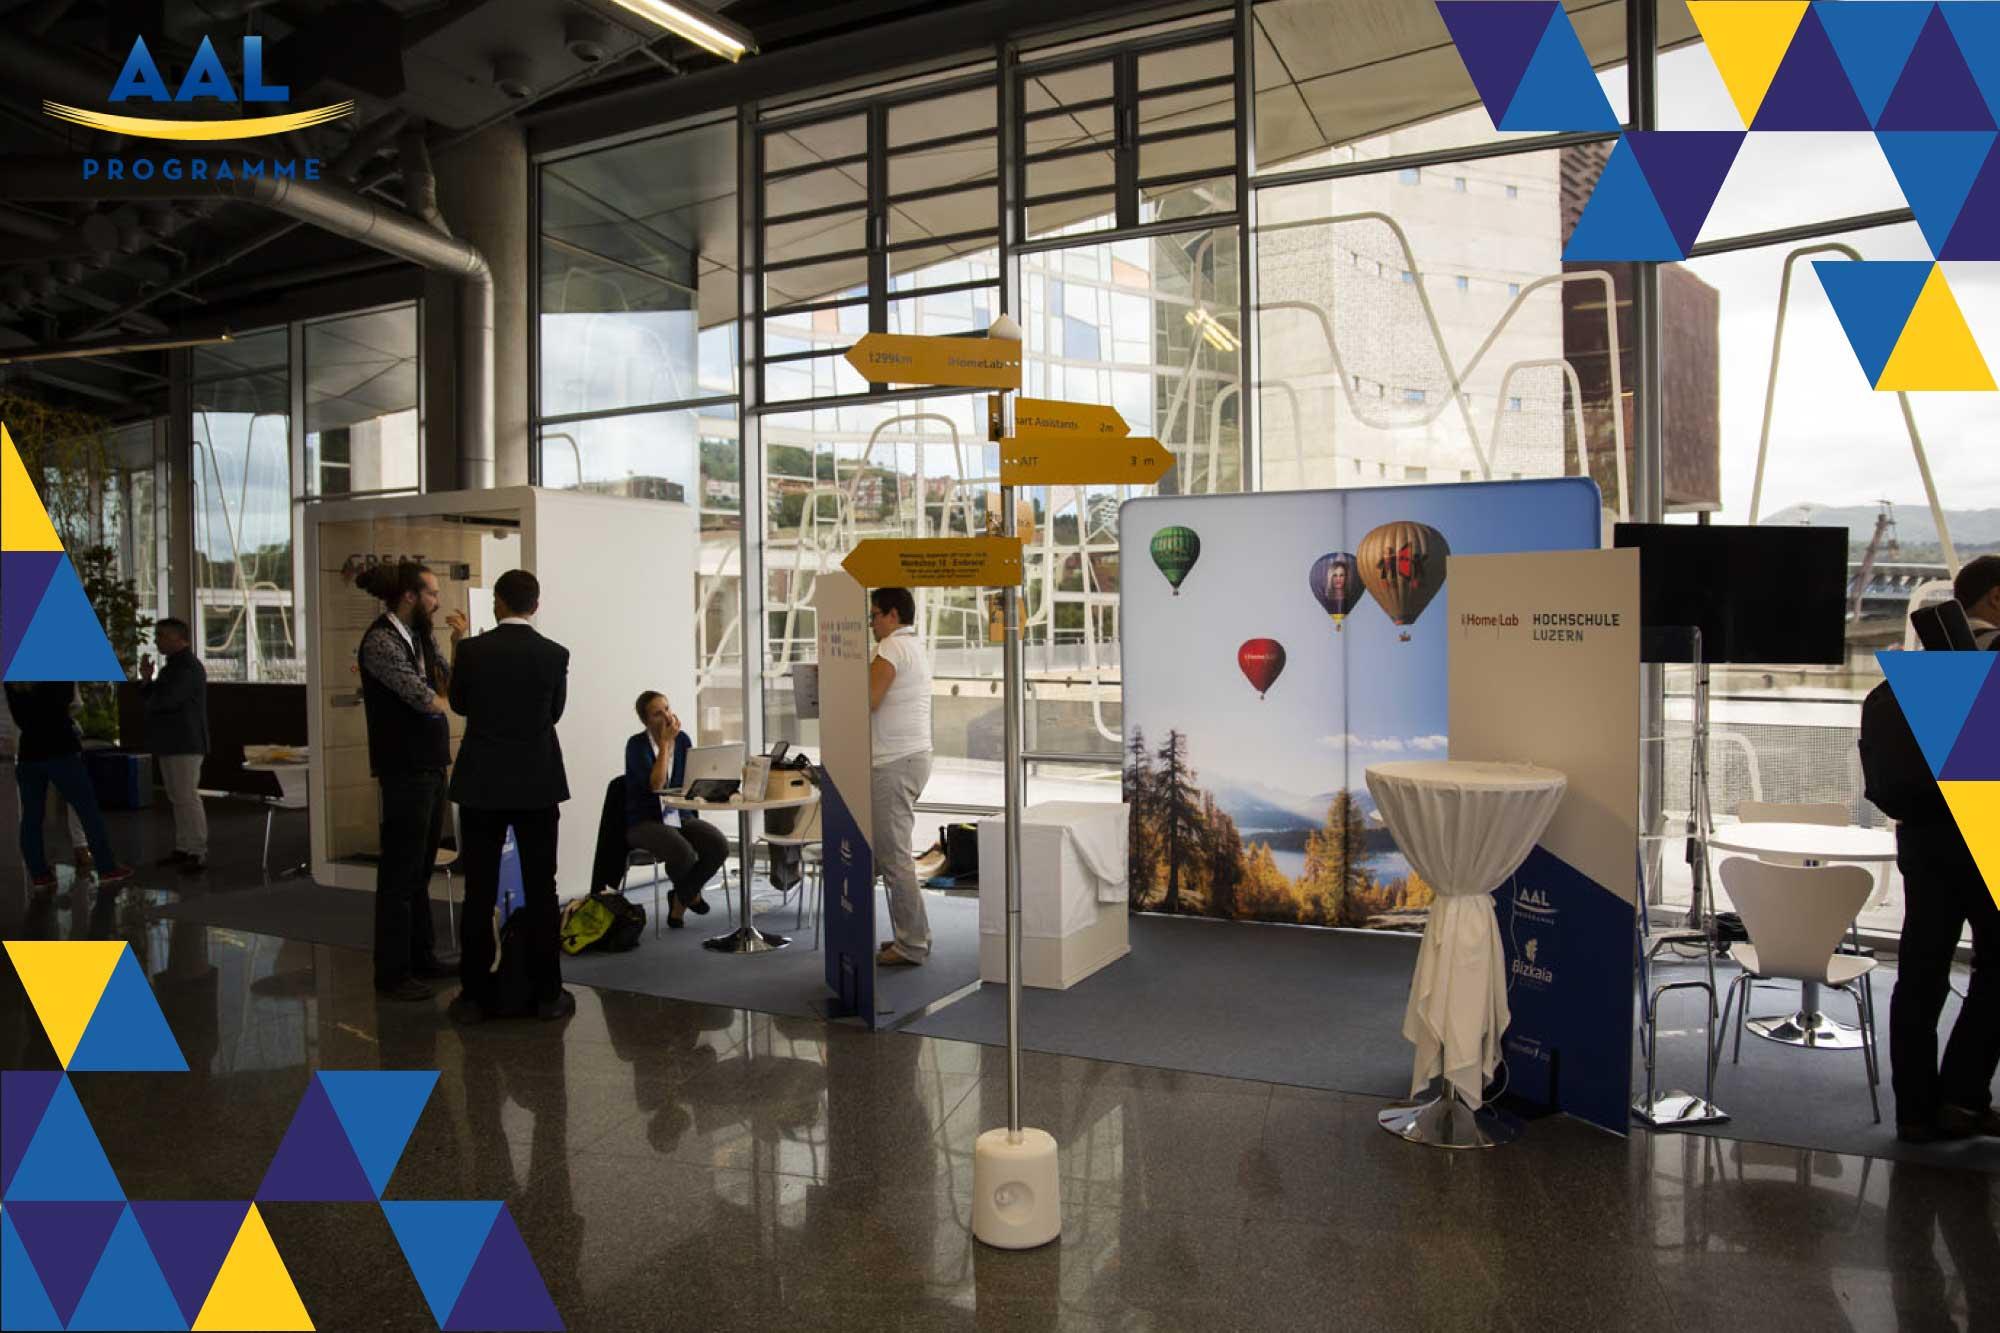 aal_exhibitors